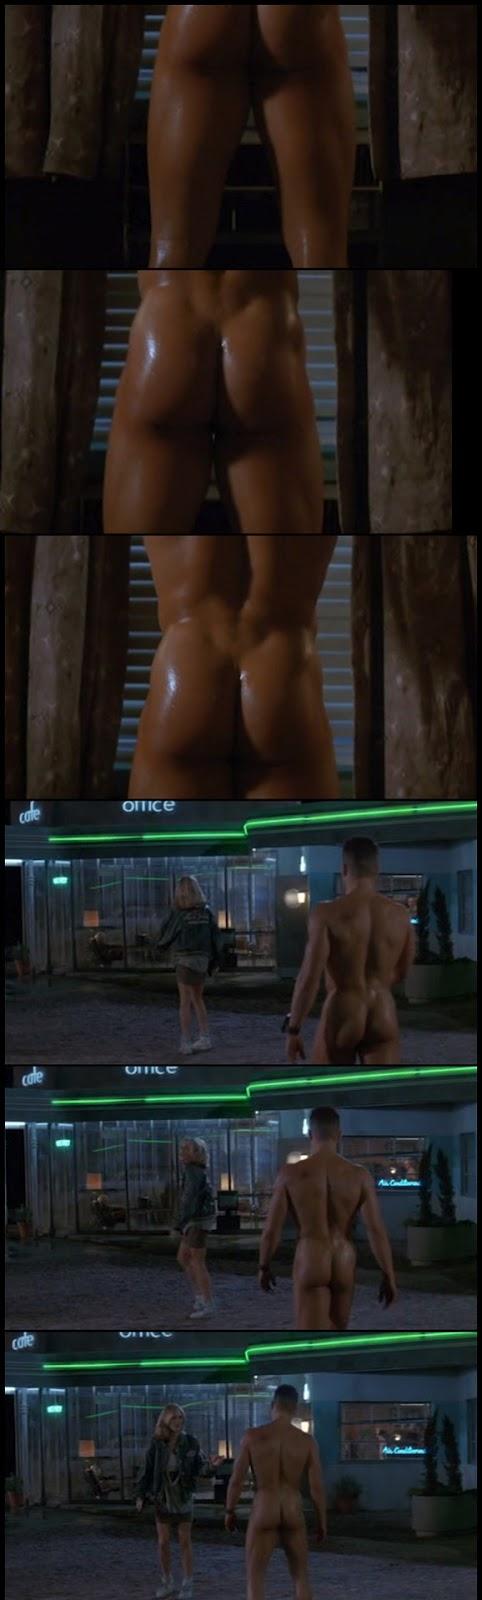 Venus 2000 orgasm